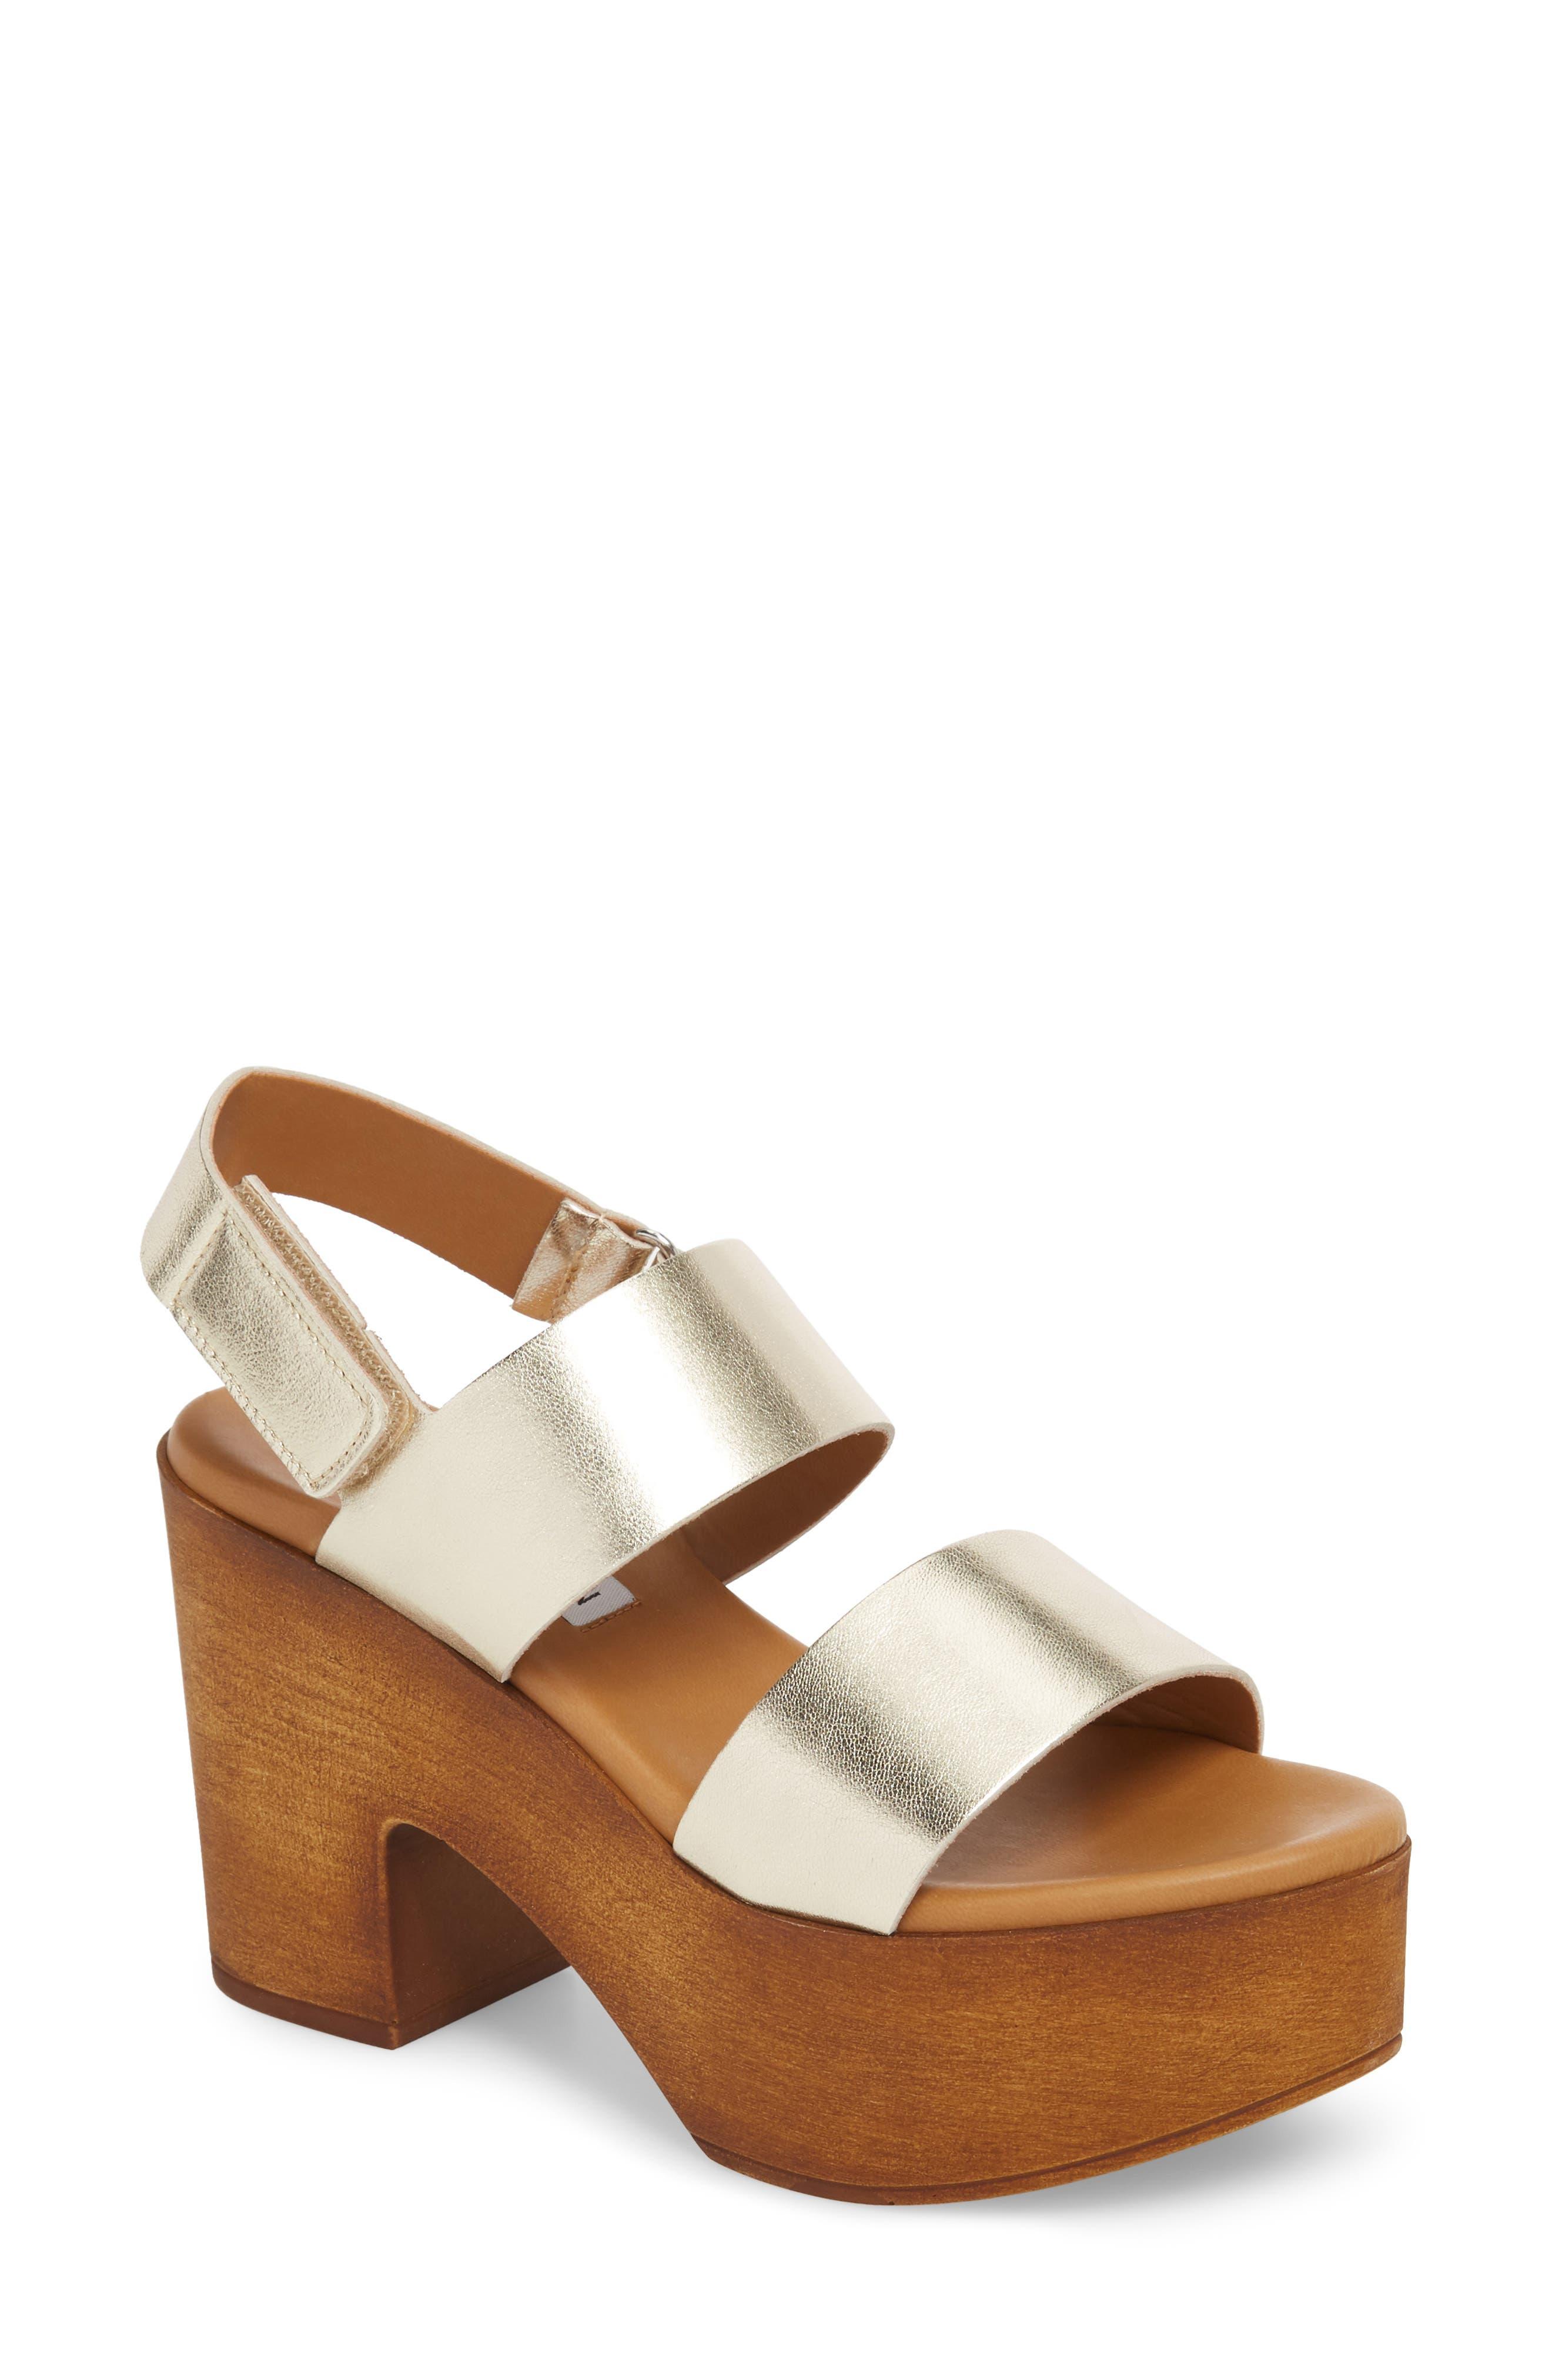 Marena Slingback Platform Sandal,                             Main thumbnail 1, color,                             Champagne